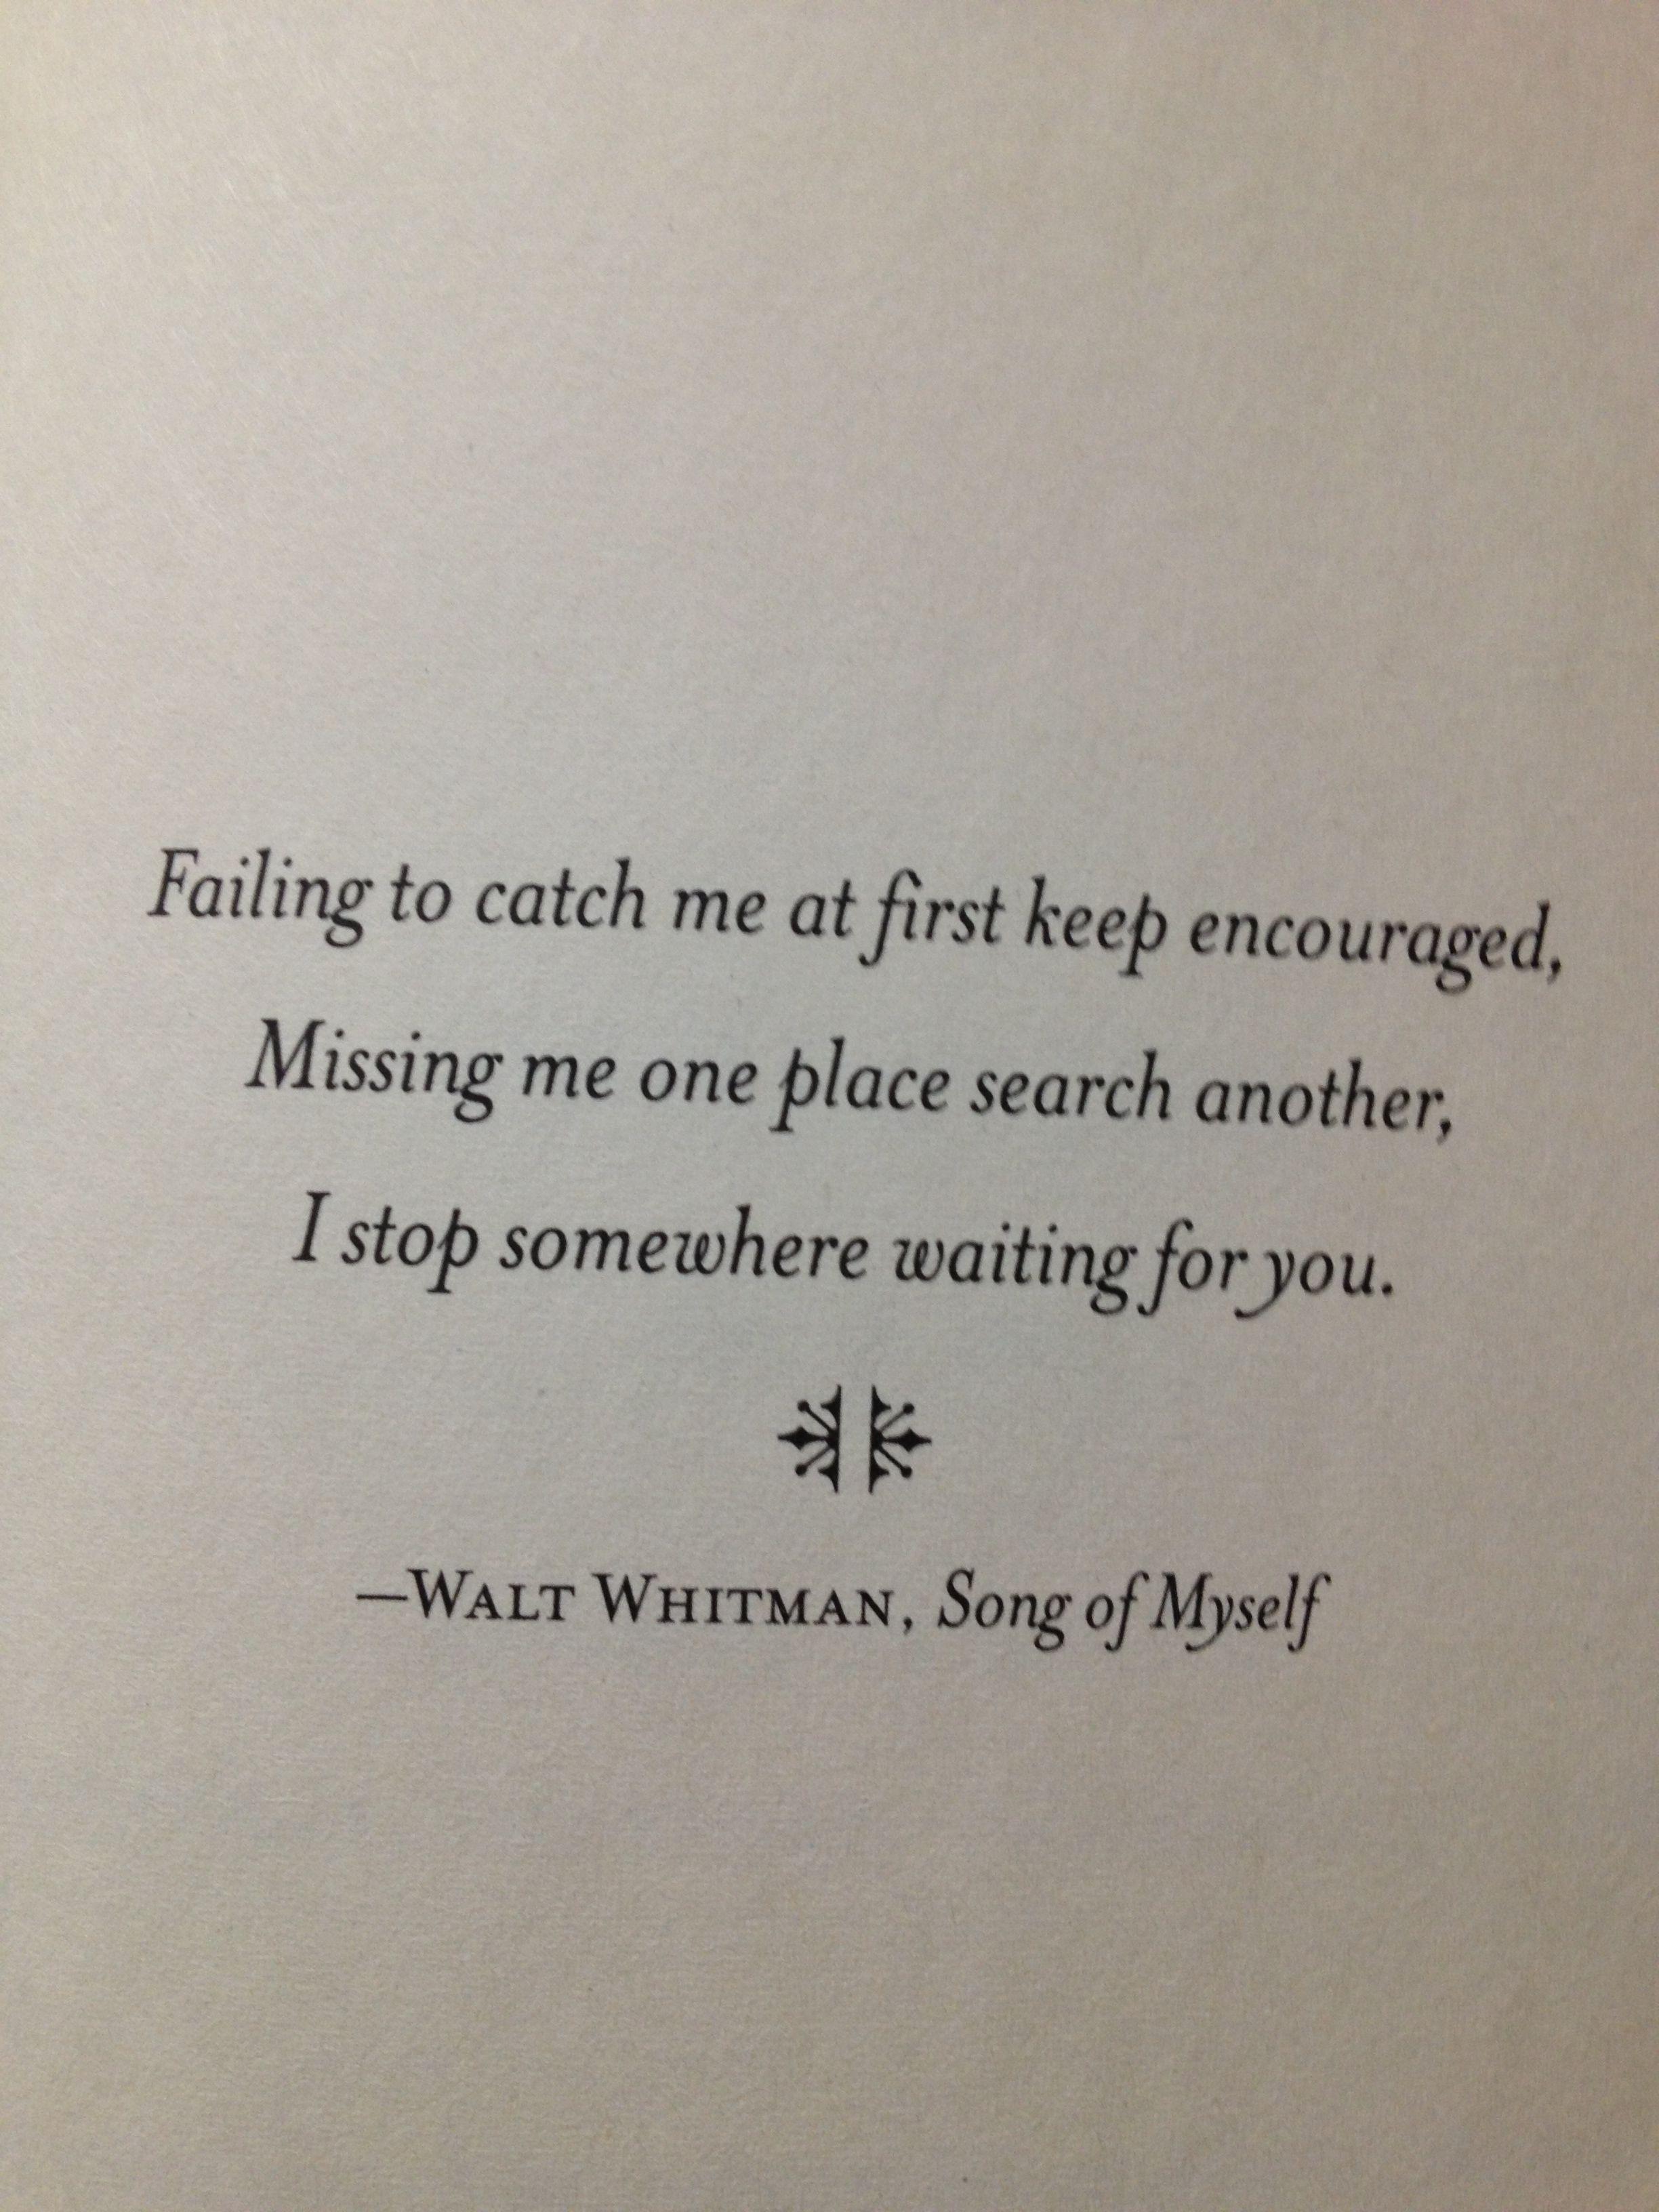 Citaten Uit Literatuur : Walt whitman i stop somewhere waiting for you. walt whitman